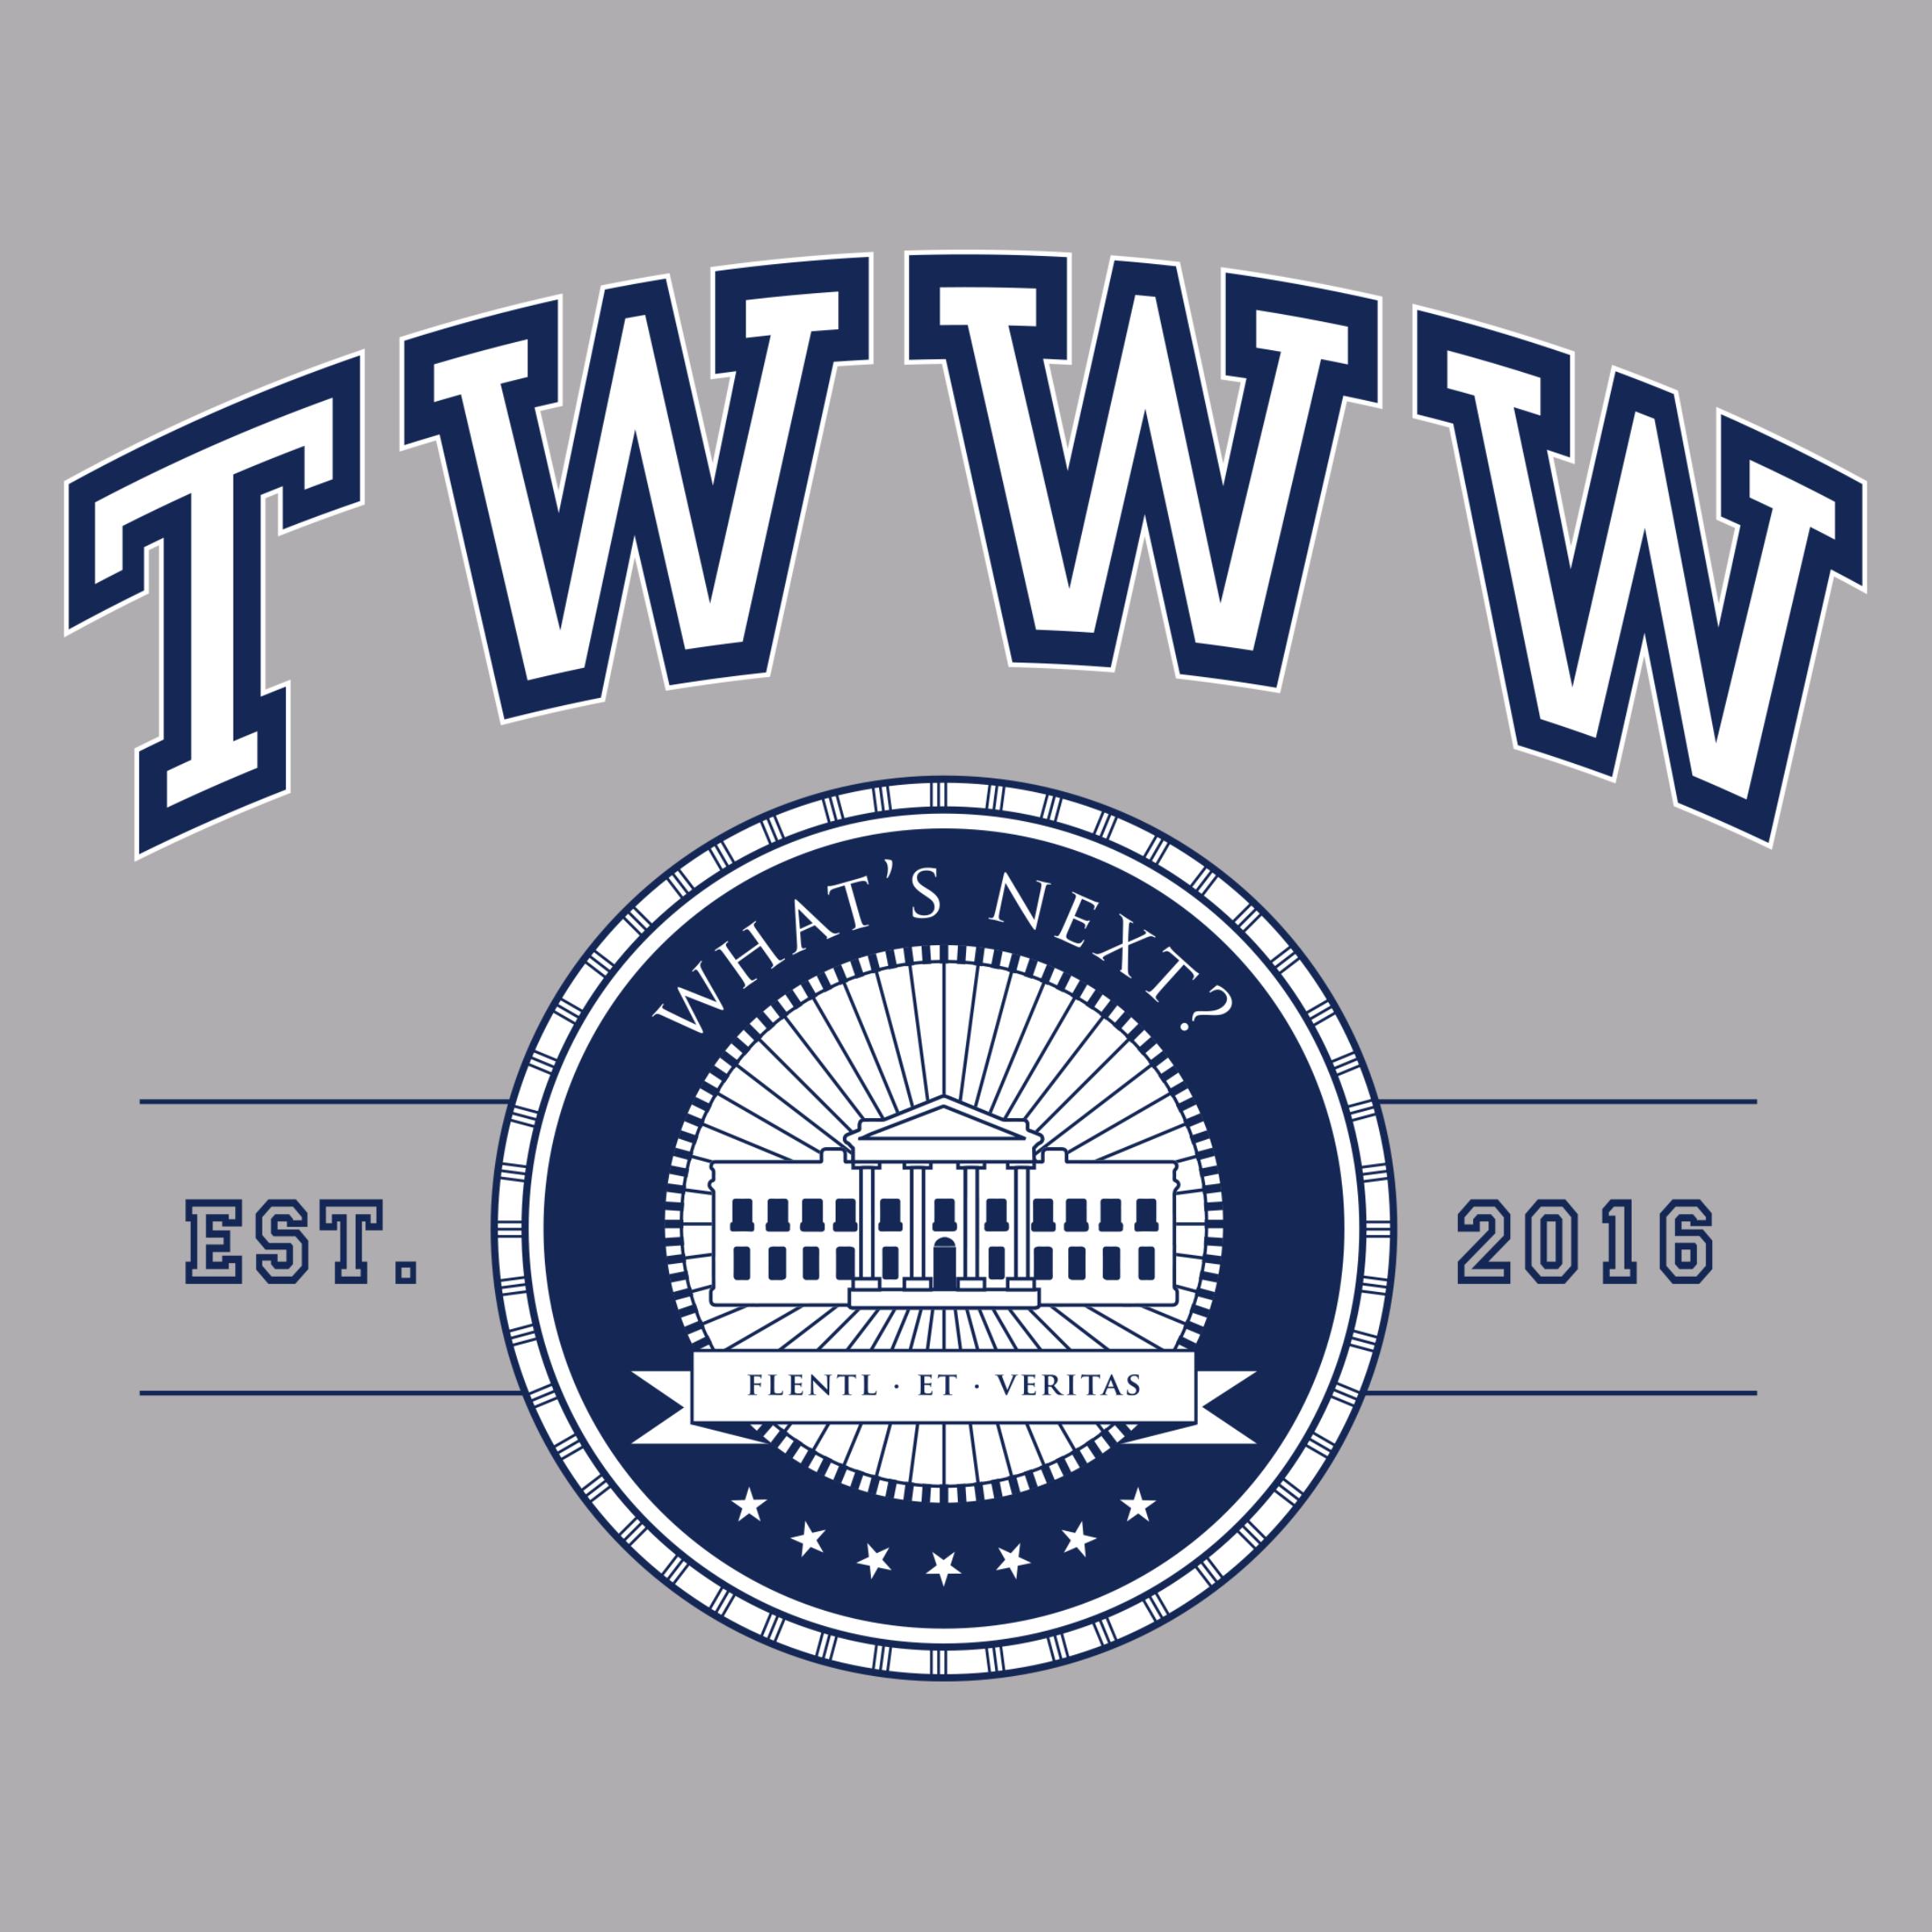 TWWW University